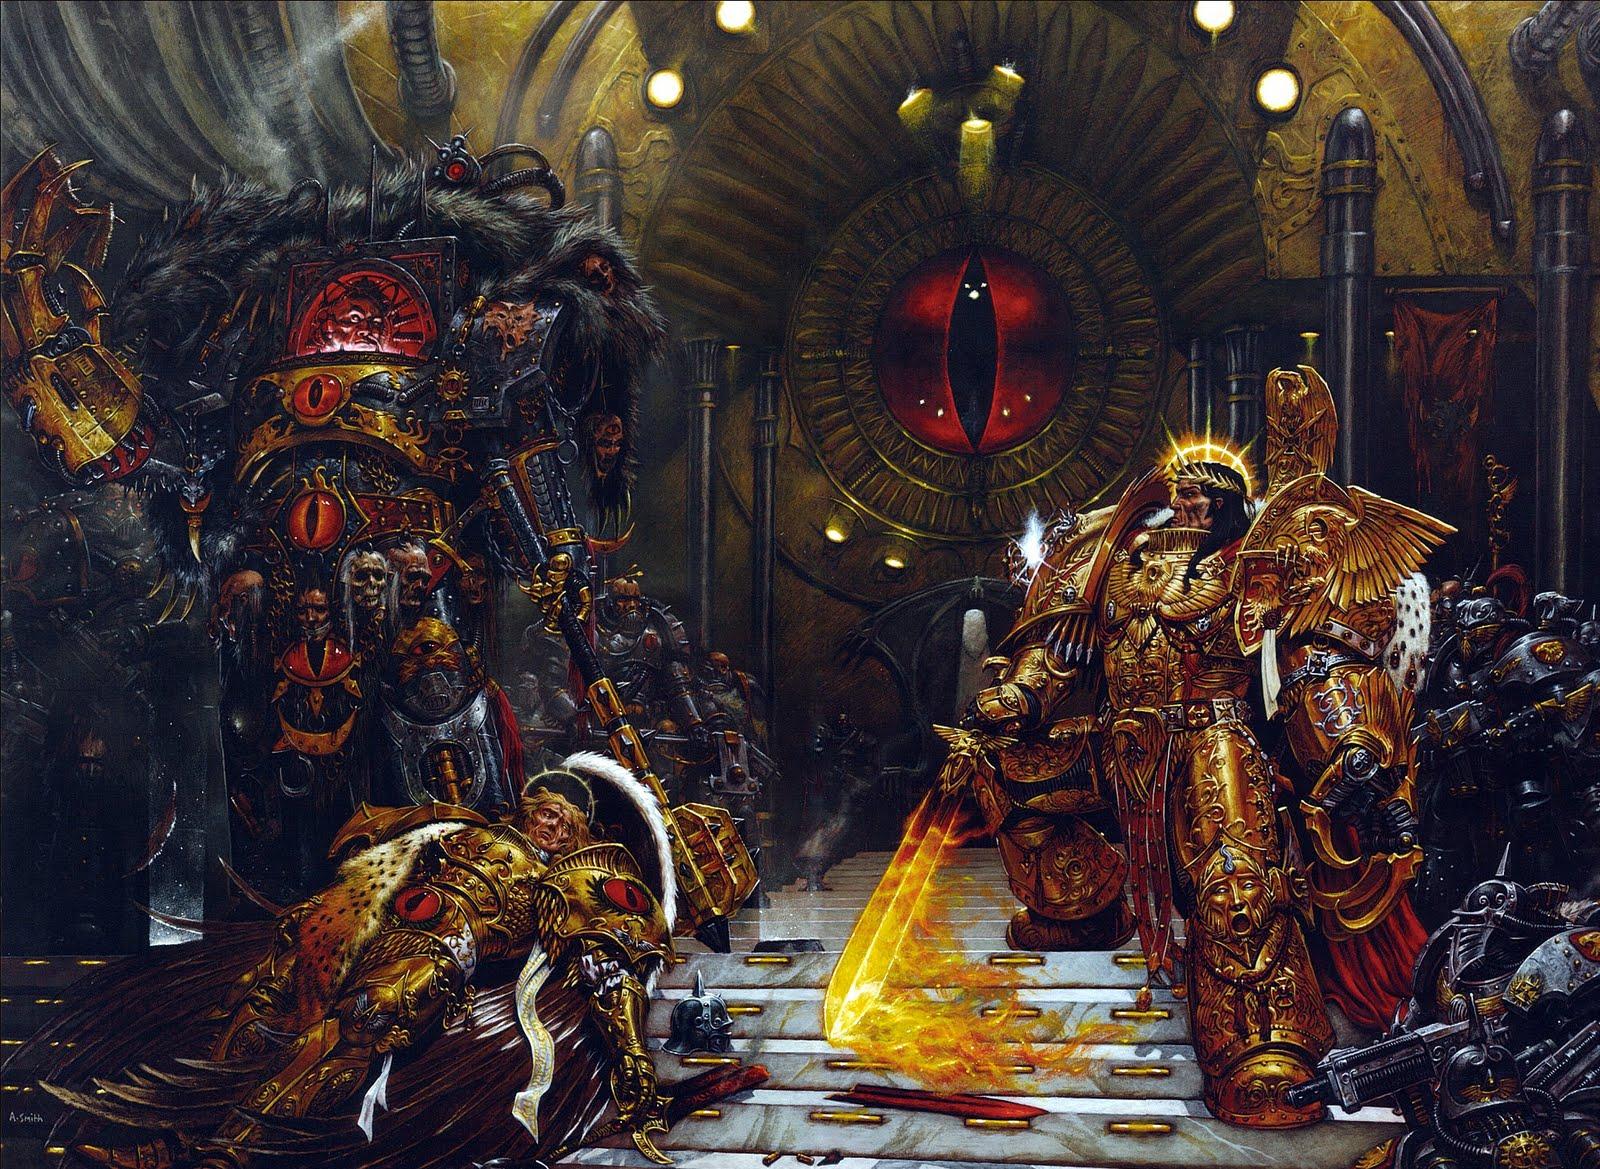 [W30K] L'Empereur de l'Humanité / The Emperor of Mankind 879696EmperorVSHorus